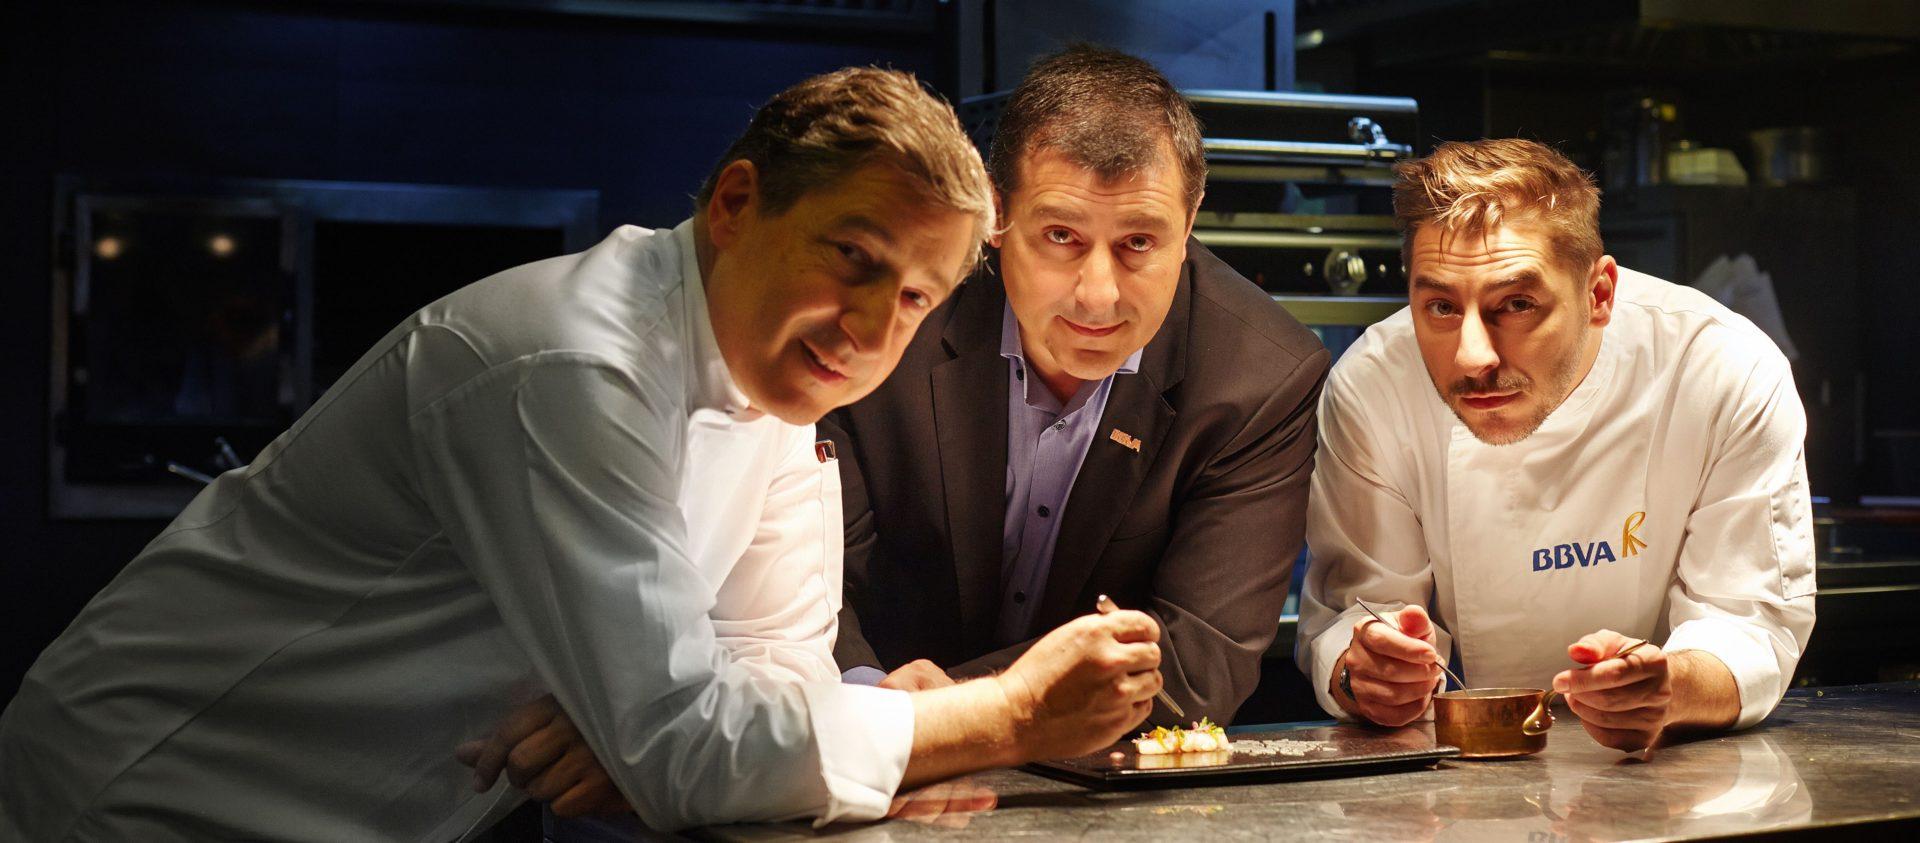 Famoso Cocina Barata Preside Reino Unido Imágenes - Ideas de ...